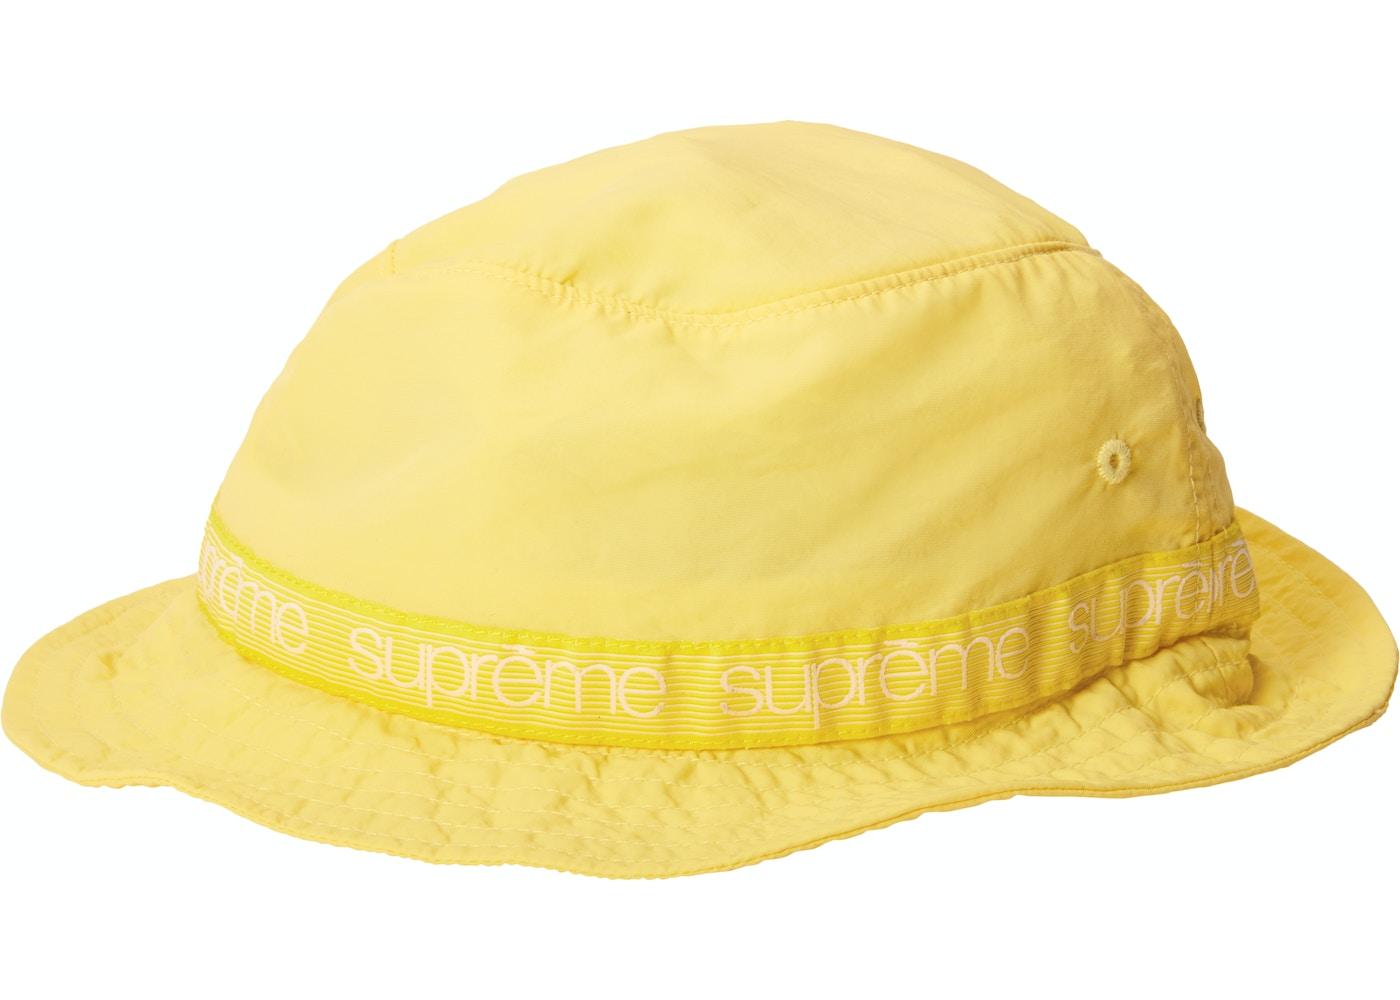 Supreme Tonal Taping Crusher Light Yellow - SS18 4b48202bcef